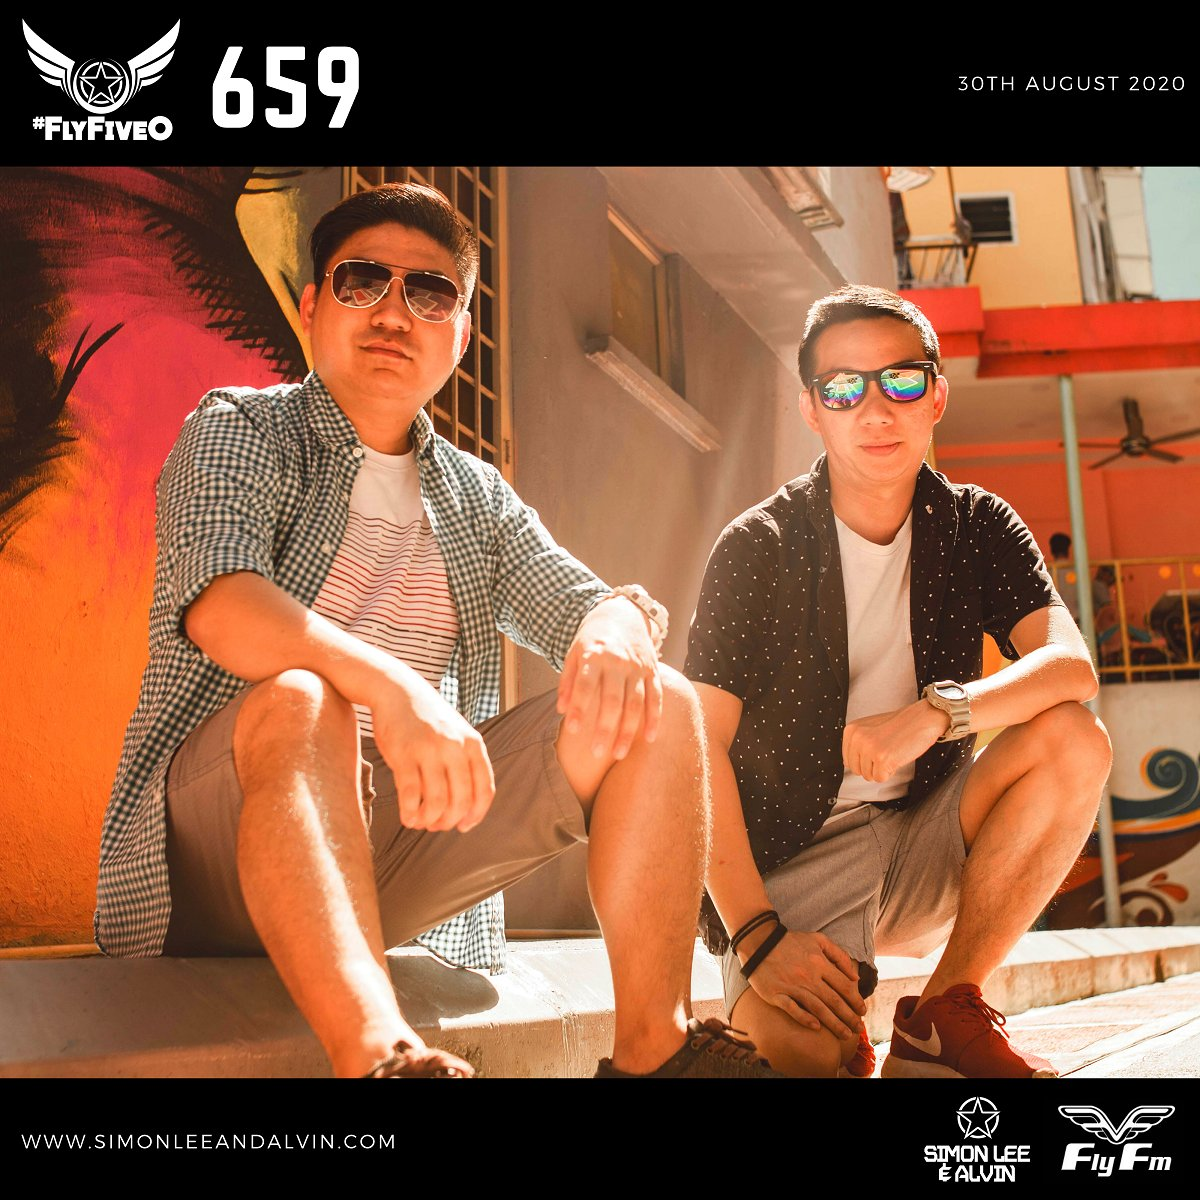 [TONIGHT - 12AM - LIVE] All new episode FLY FM #FlyFiveO #659 feat new releases from @Richard_Durand @official_JES @borisfoongdj @arminvanbuuren @linneyofficial @haikalahmad_dj @iamblueyesmusic @FEEL_DJ + many more! https://t.co/KbI6wIMBCV